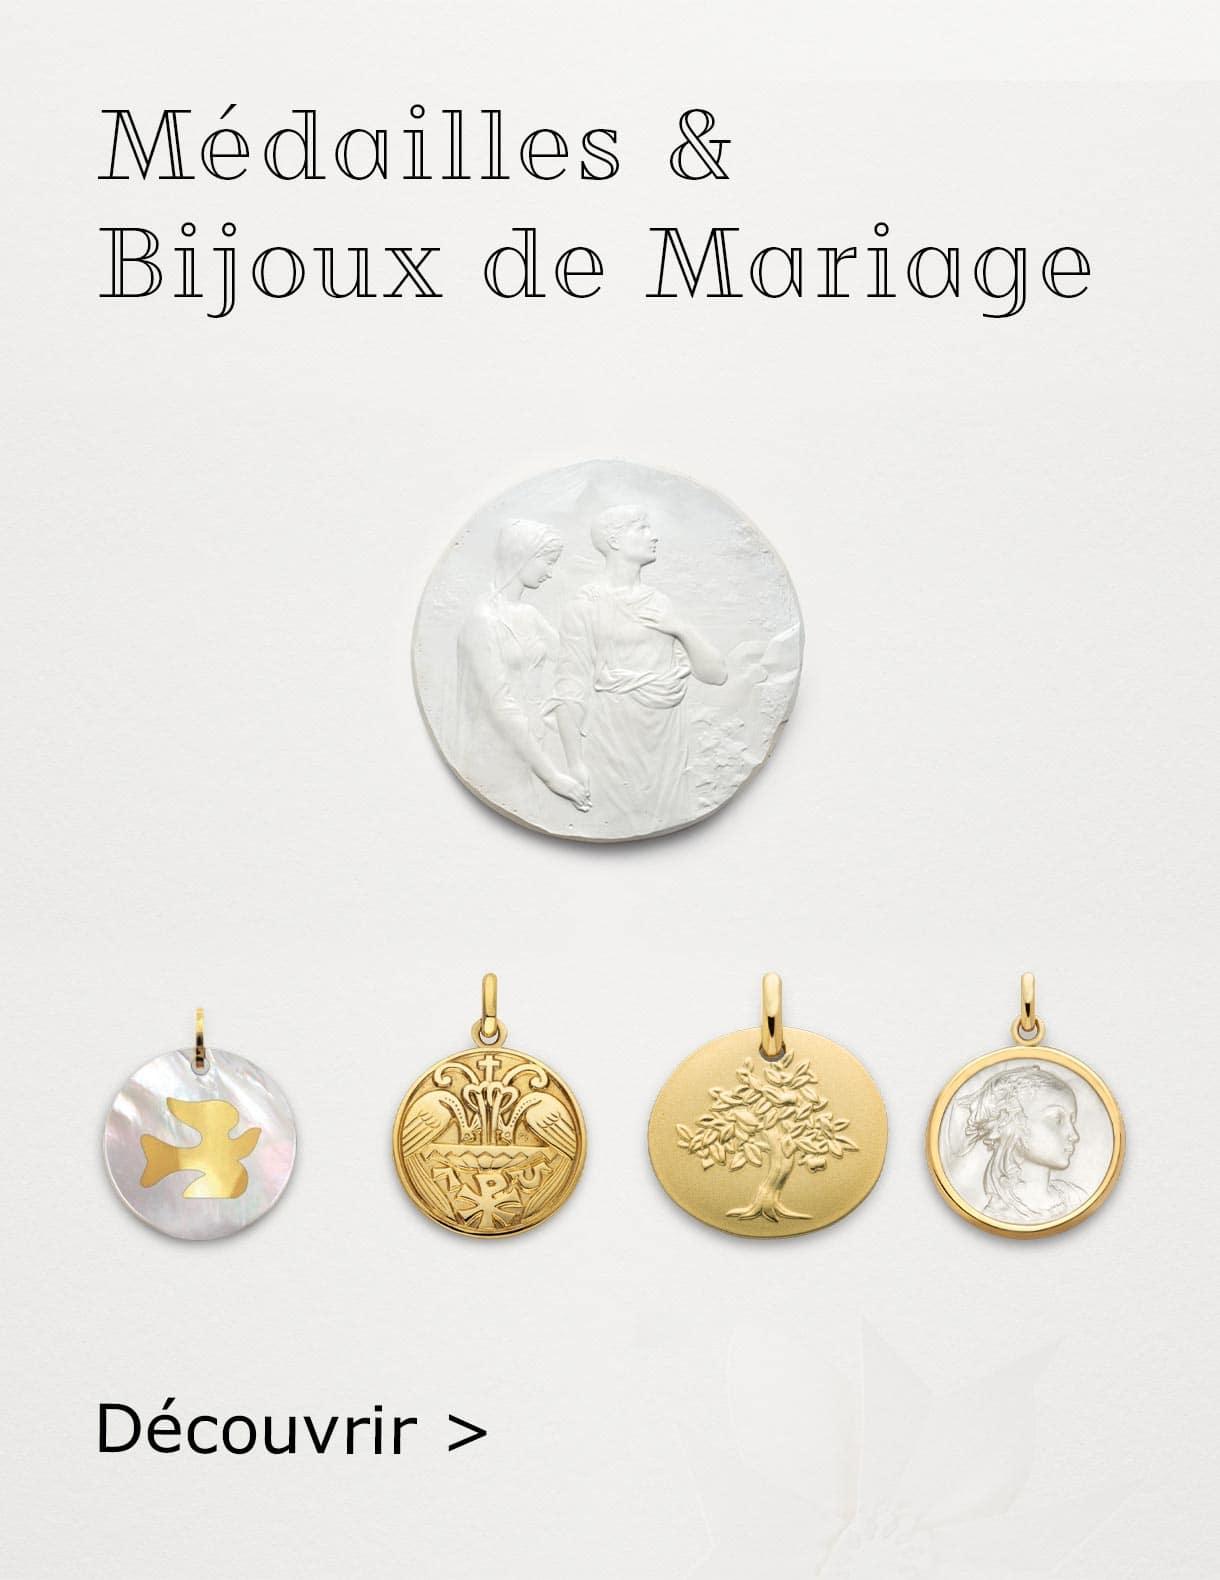 Médailles de baptême - ARTHUS BERTRAND